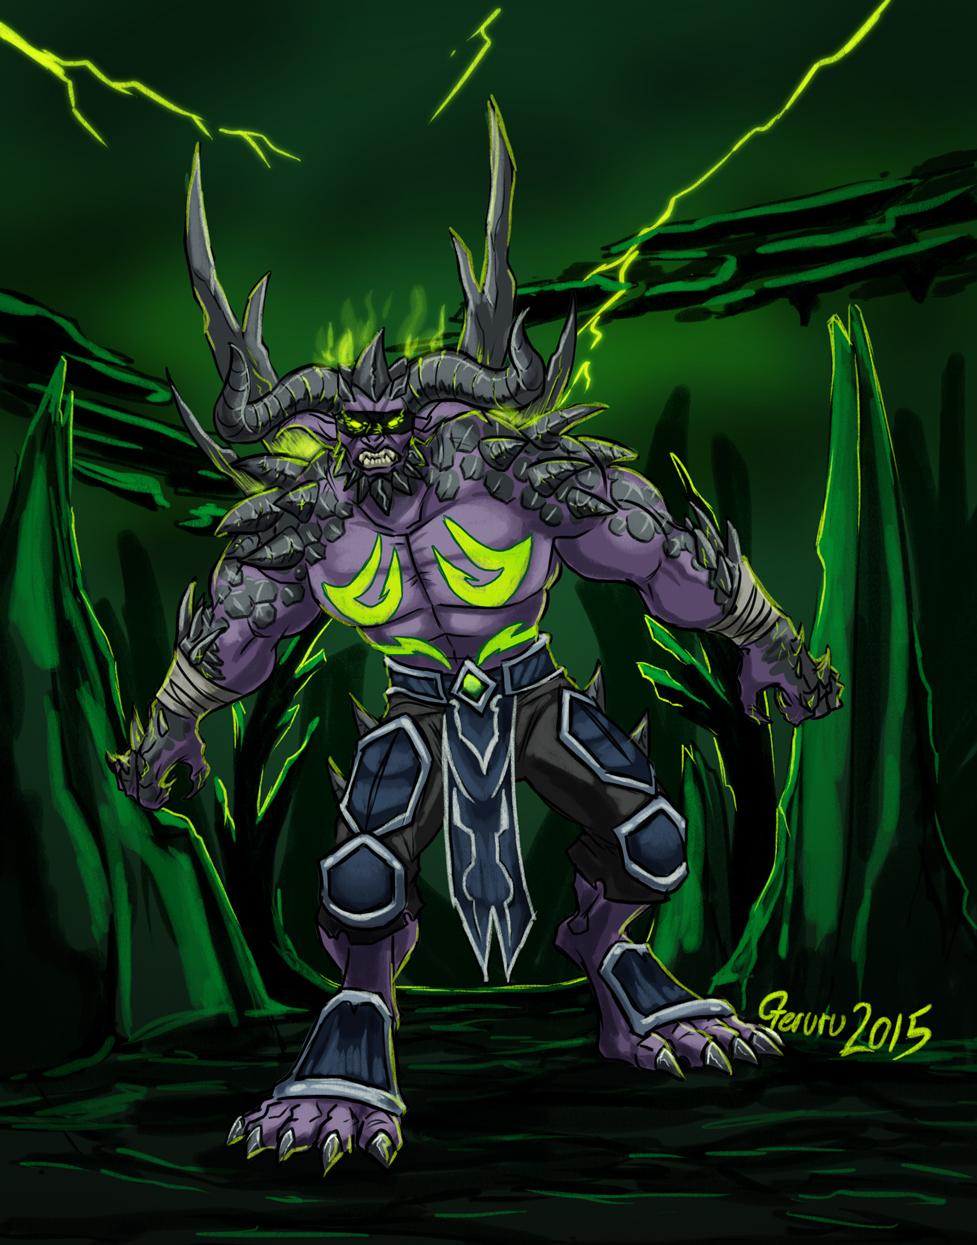 And now a Demon Hunter by geruru on DeviantArt